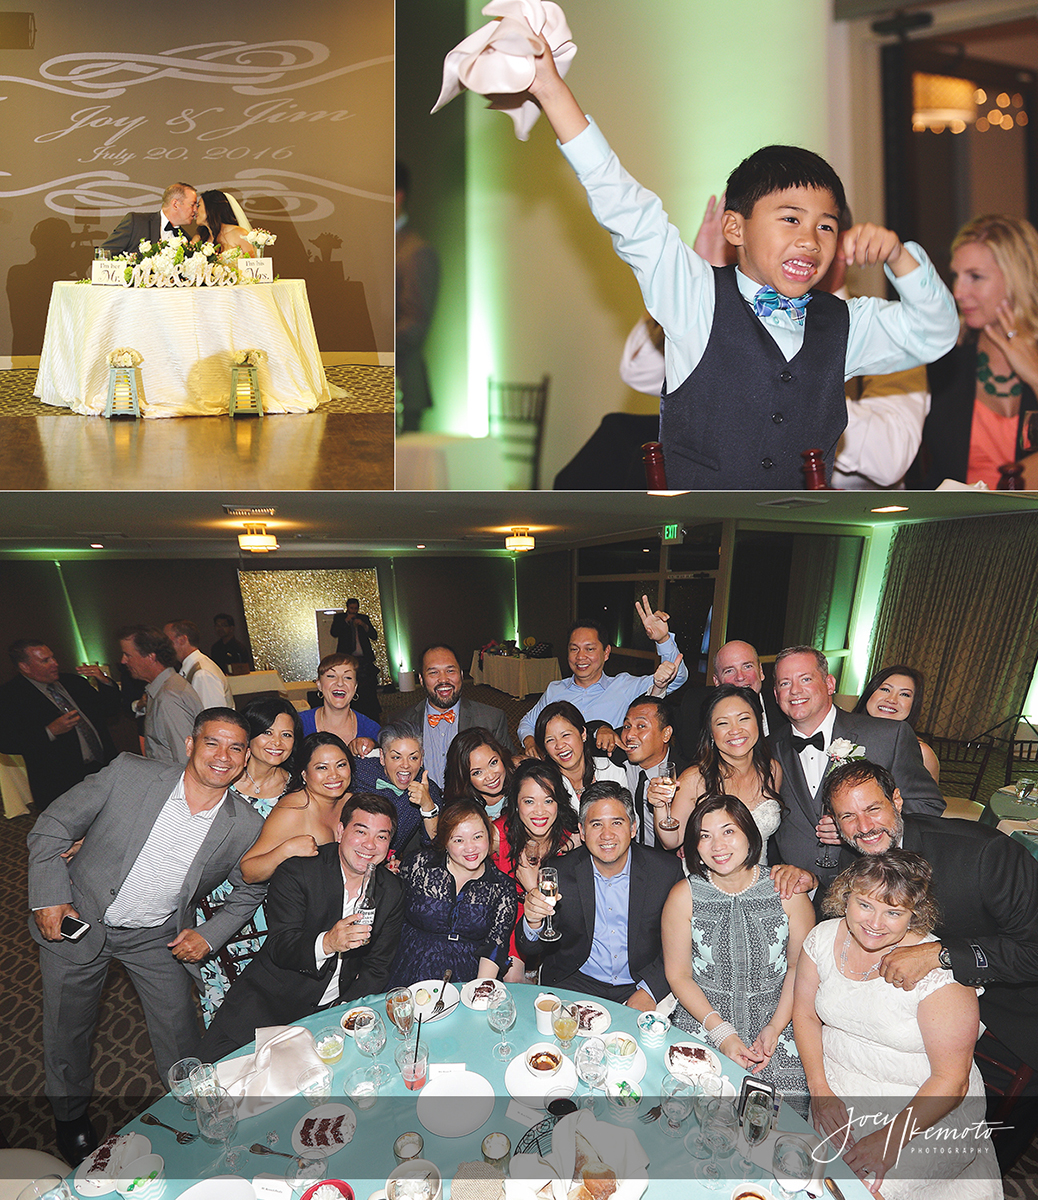 Terrena-Resort-Palos-verdes-and-La-Venta-Inn-Wedding_0055_Blog-Collage-1471479914014